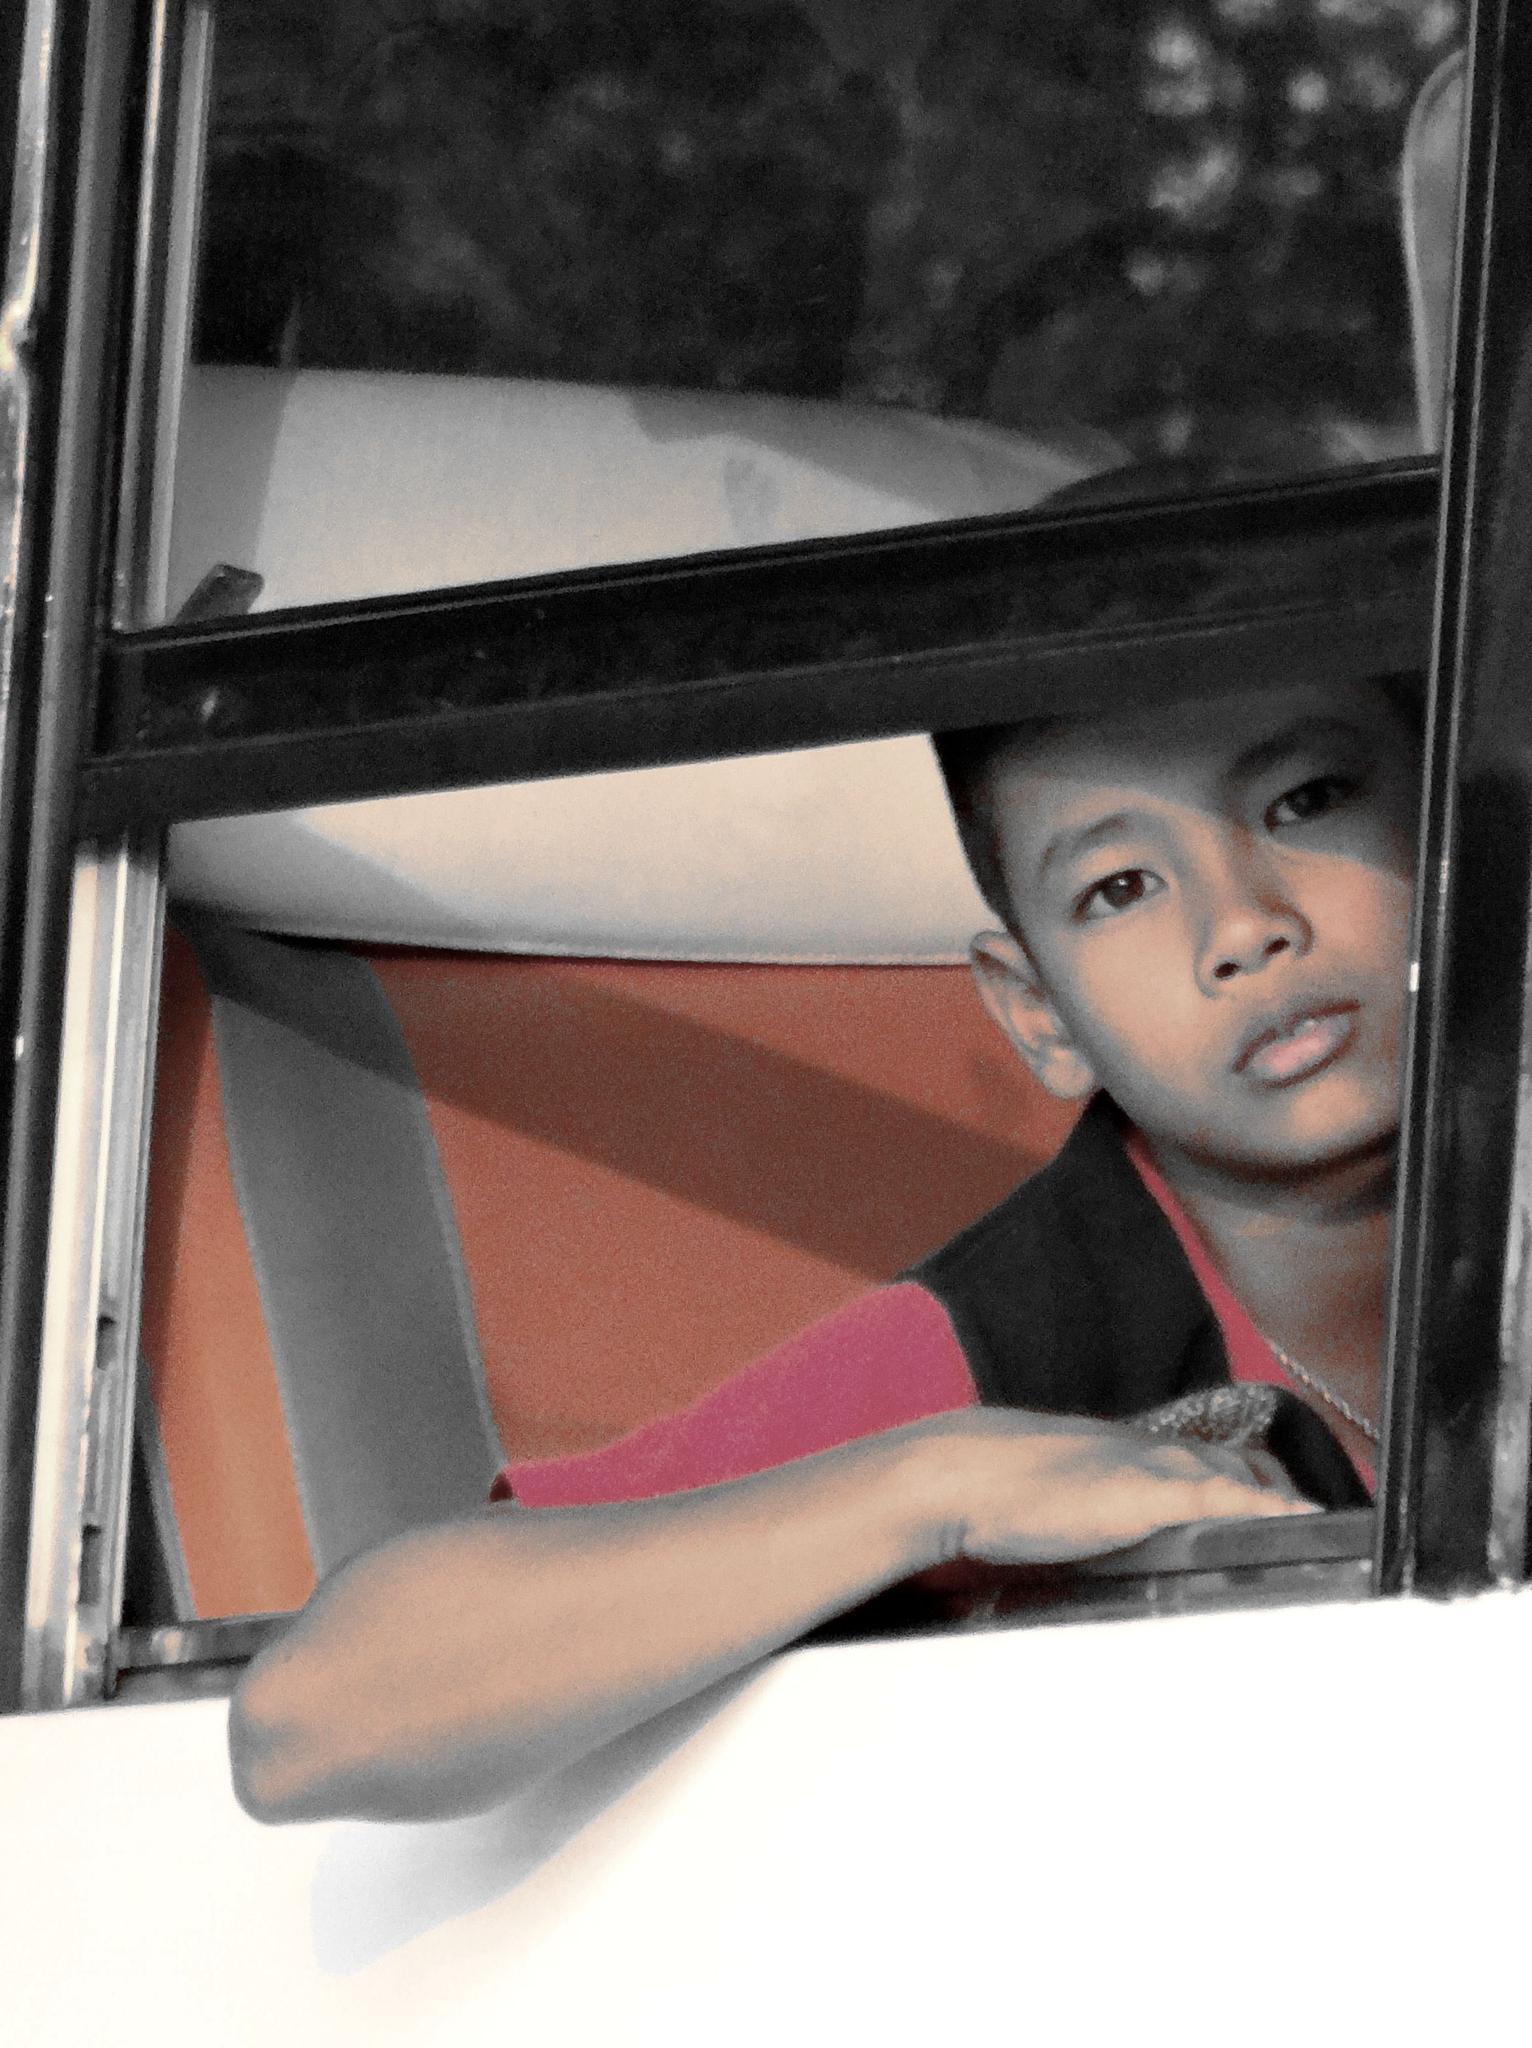 Scènes de la vie ordinaire sur une autoroute de Thaïlande. by Daniel Van der Beken - Iribarren